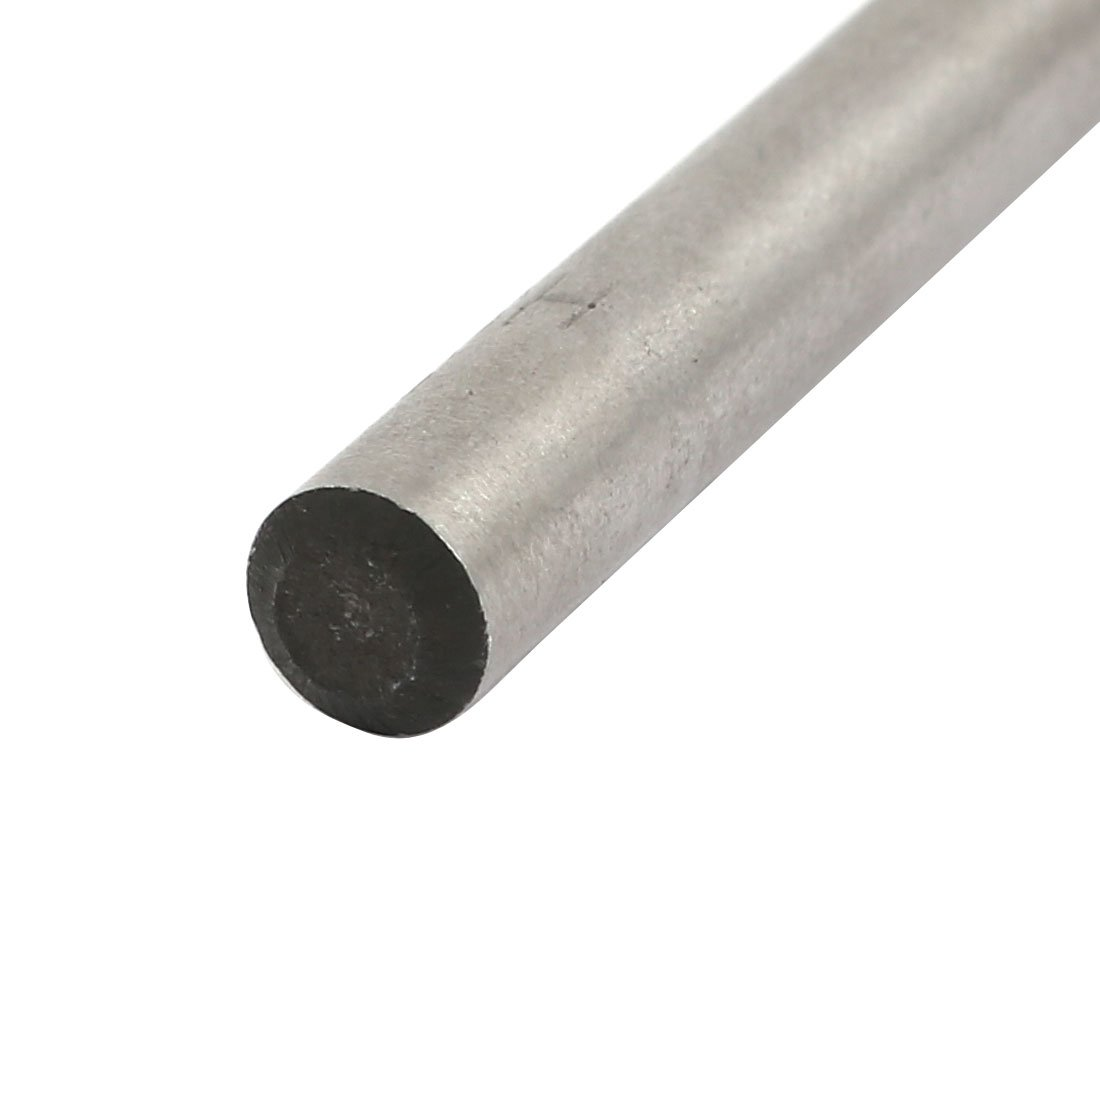 uxcell 5mm Diameter 82mm Length HSS 9341 Round Shank Twist Drill Bit Drilling Tool 2pcs